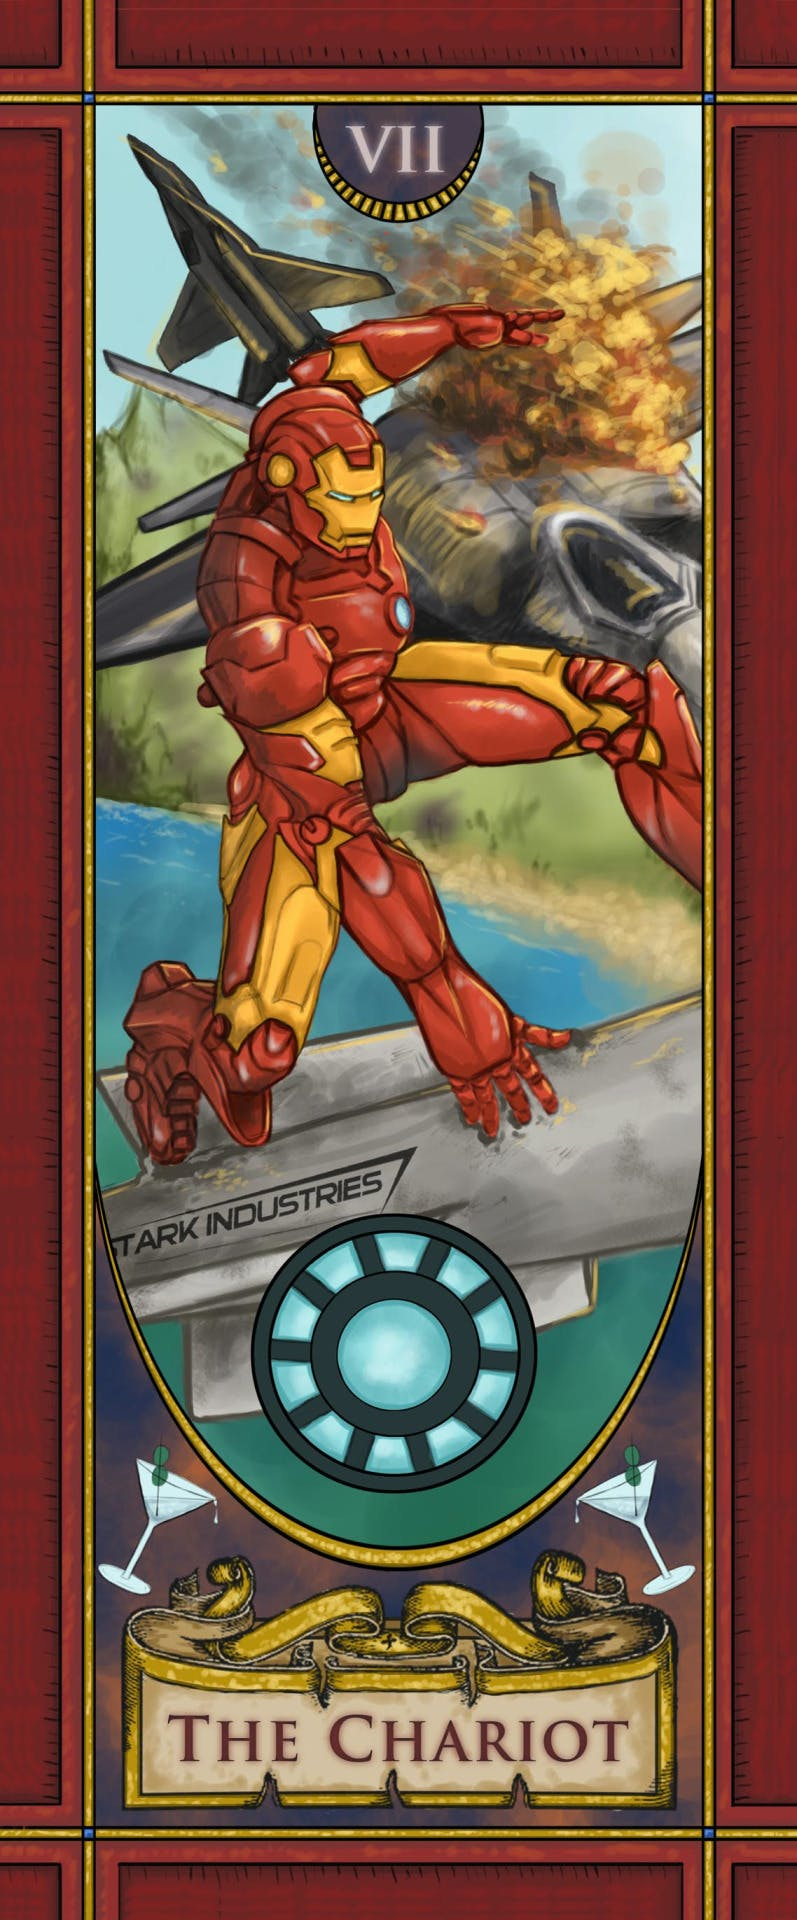 Tony Stark riding a Stark Industries warhead represents the Major Arcana card the Chariot.